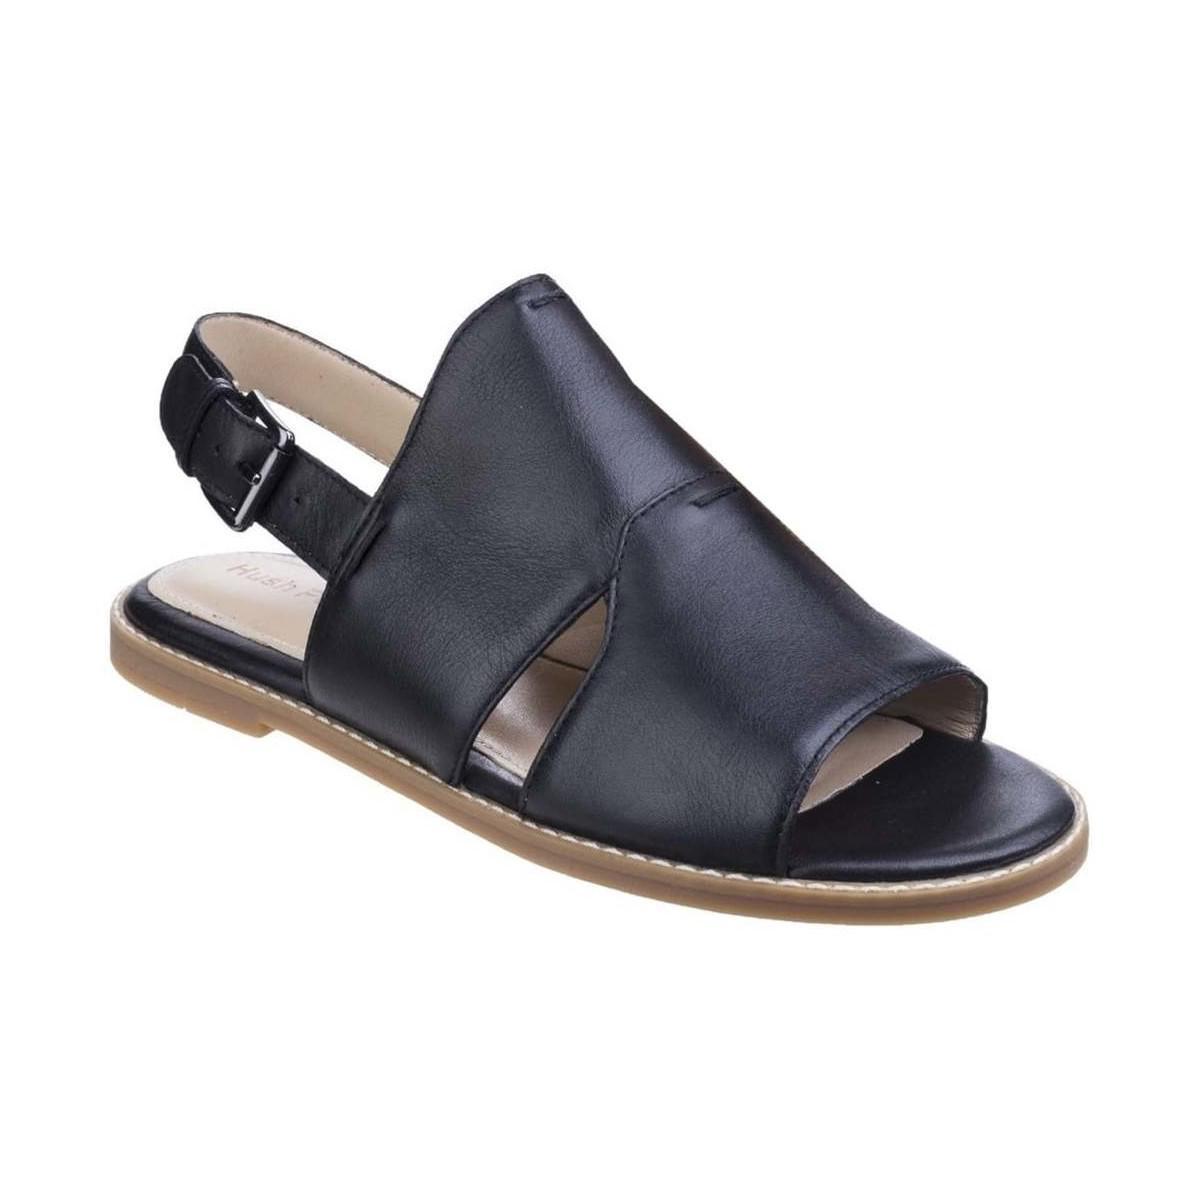 65af8e0e32086 Hush Puppies Adiron Chrissie Womens Flat Sandals Women s Sandals In ...